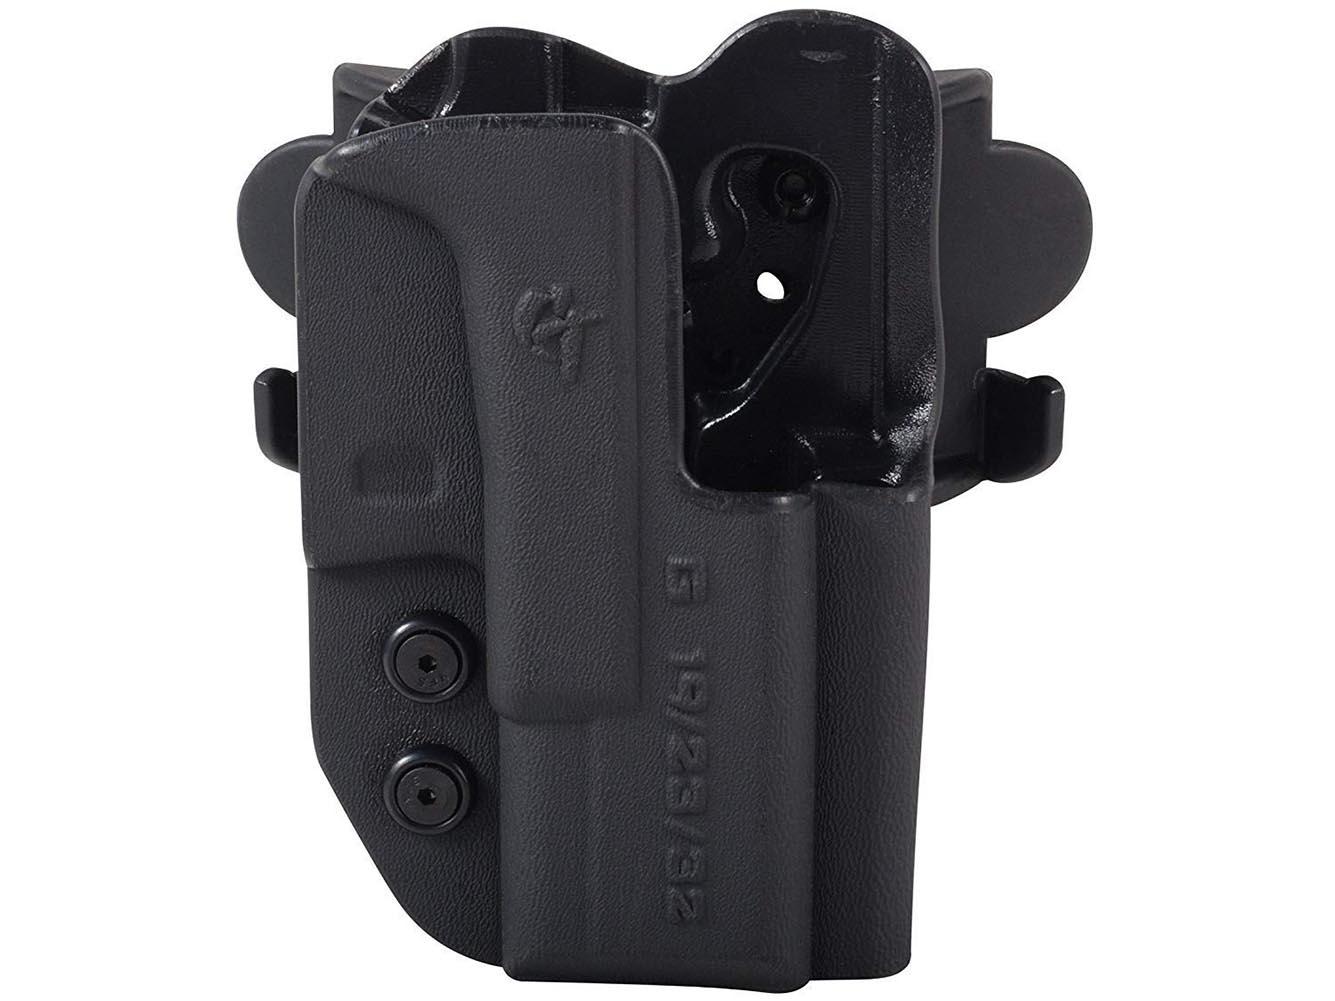 COMP-TAC International OWB Modular Mount RSC Holster For Glock 17/22/31 Gen5 (C241GL044RBKN)